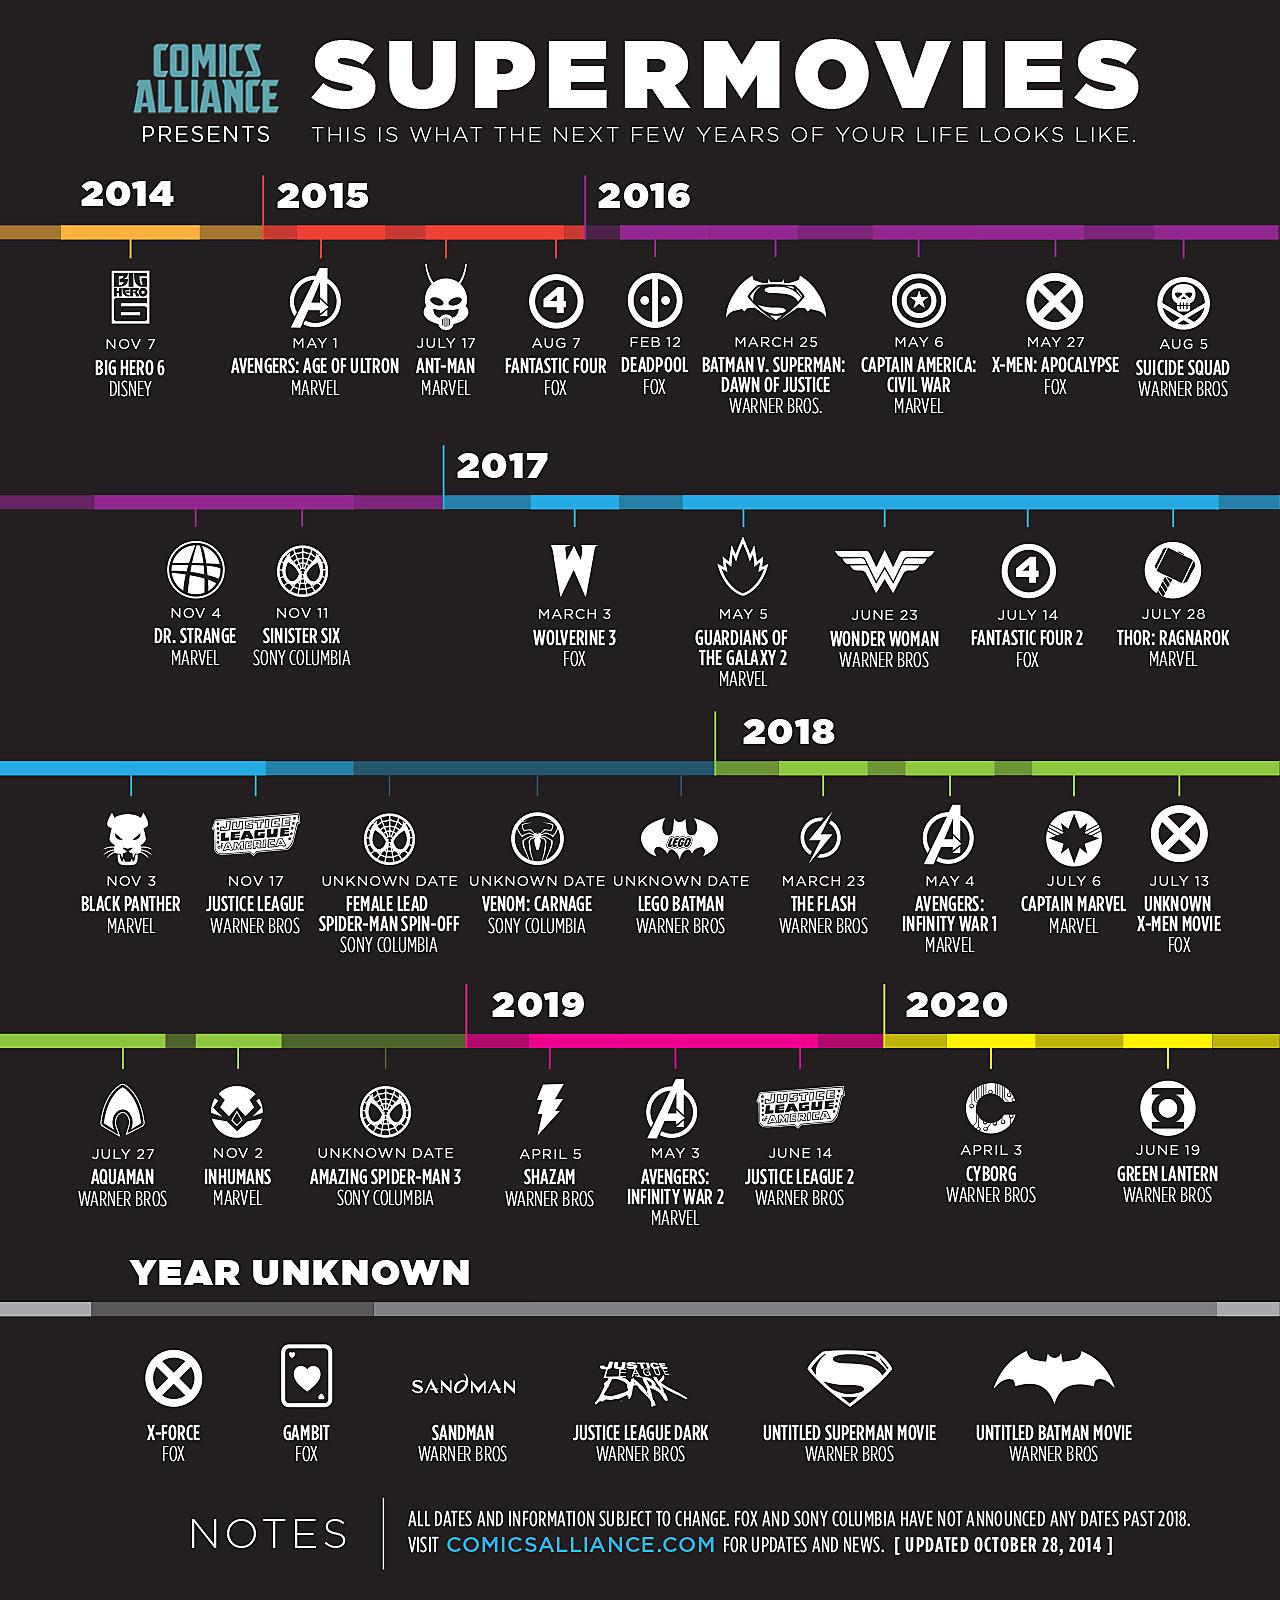 ComicsAlliance Superhero Movie Timeline Updated October 28 2014